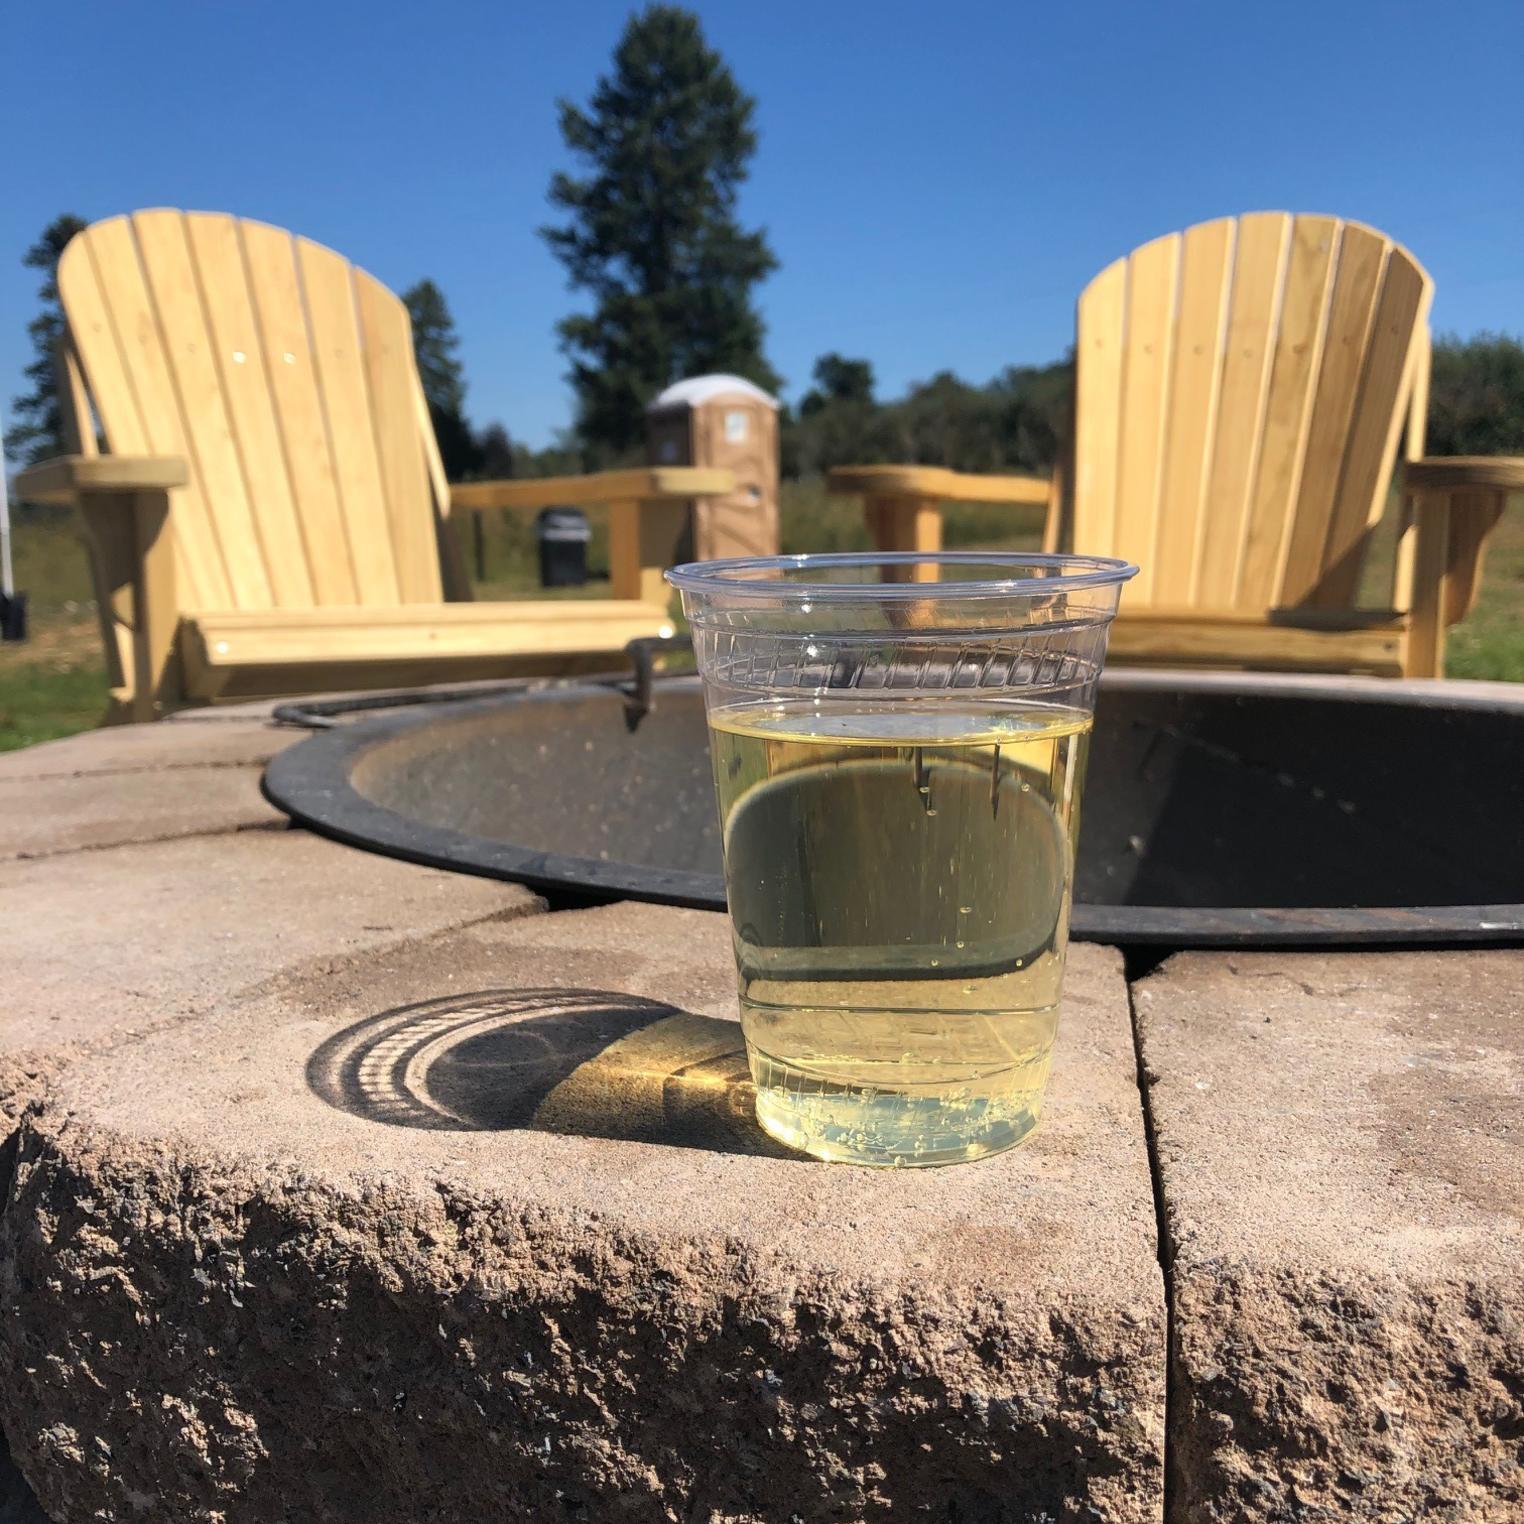 Big Hill Ciderworks